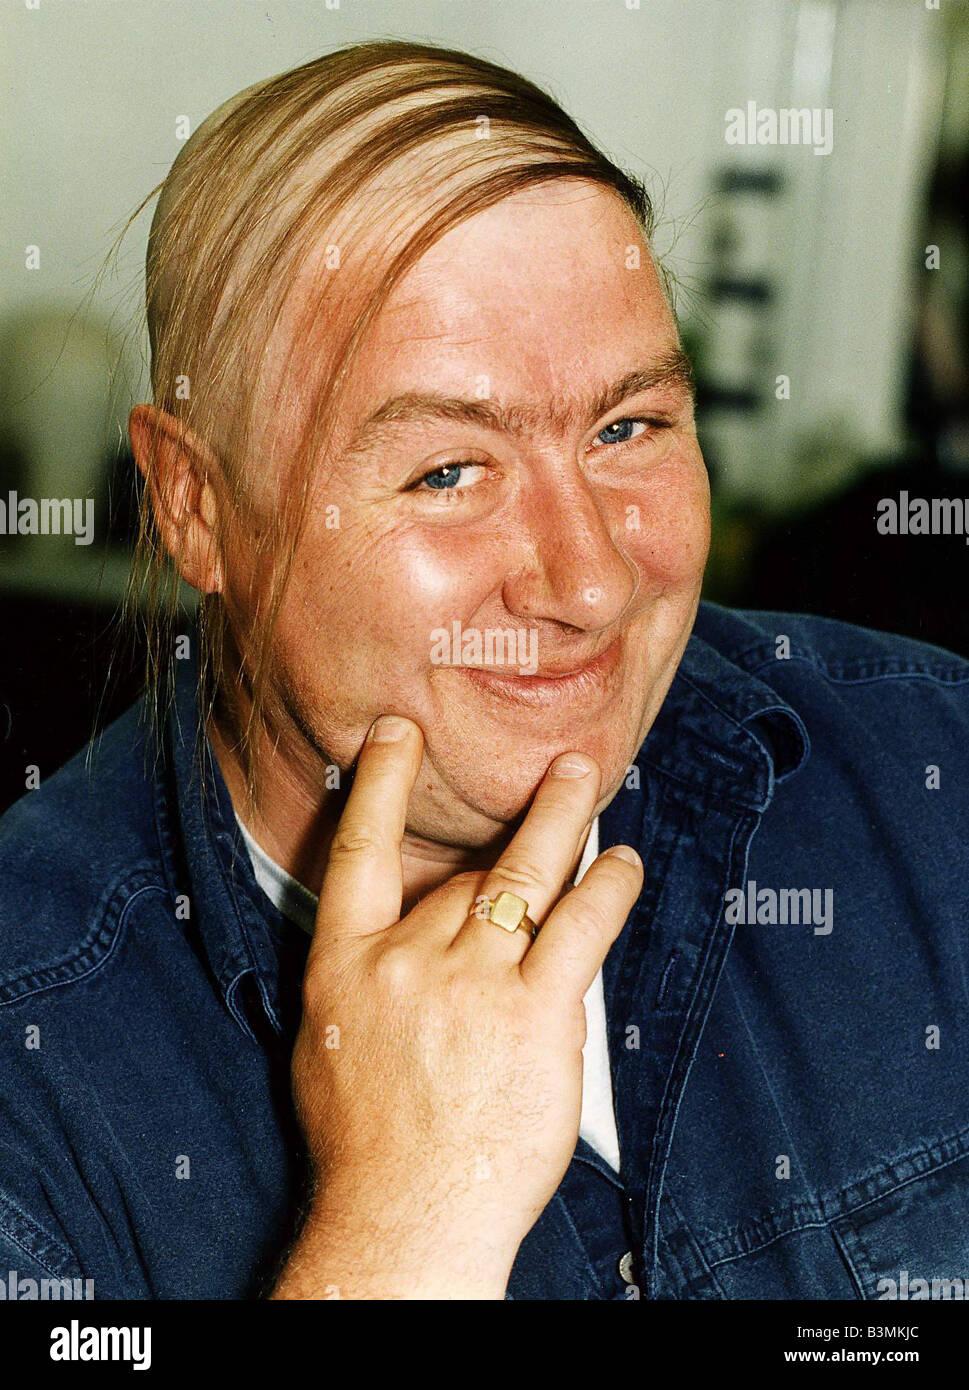 Прически у лысеющих мужчин фото